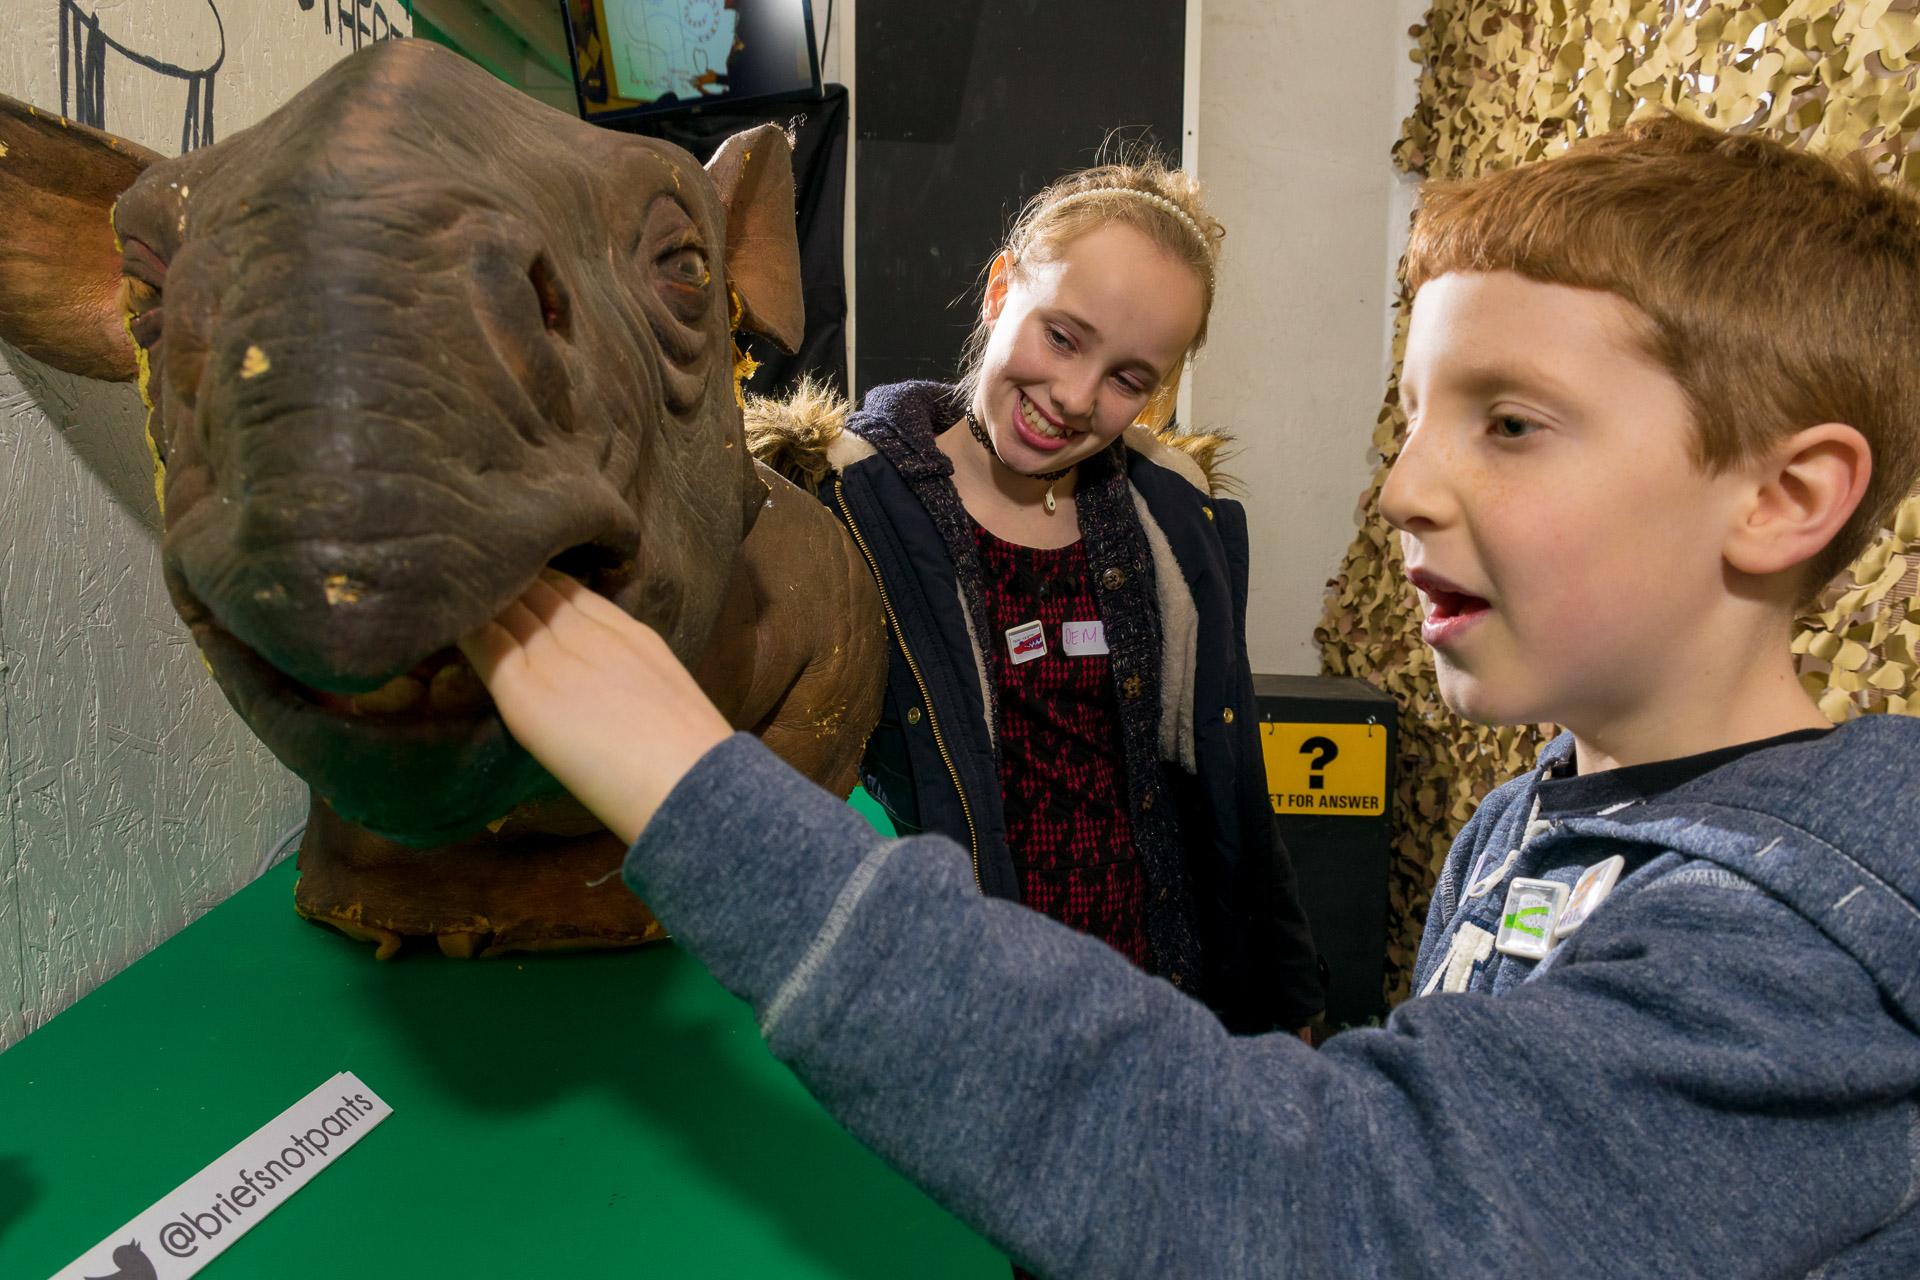 Creating the Dinostar exhibition